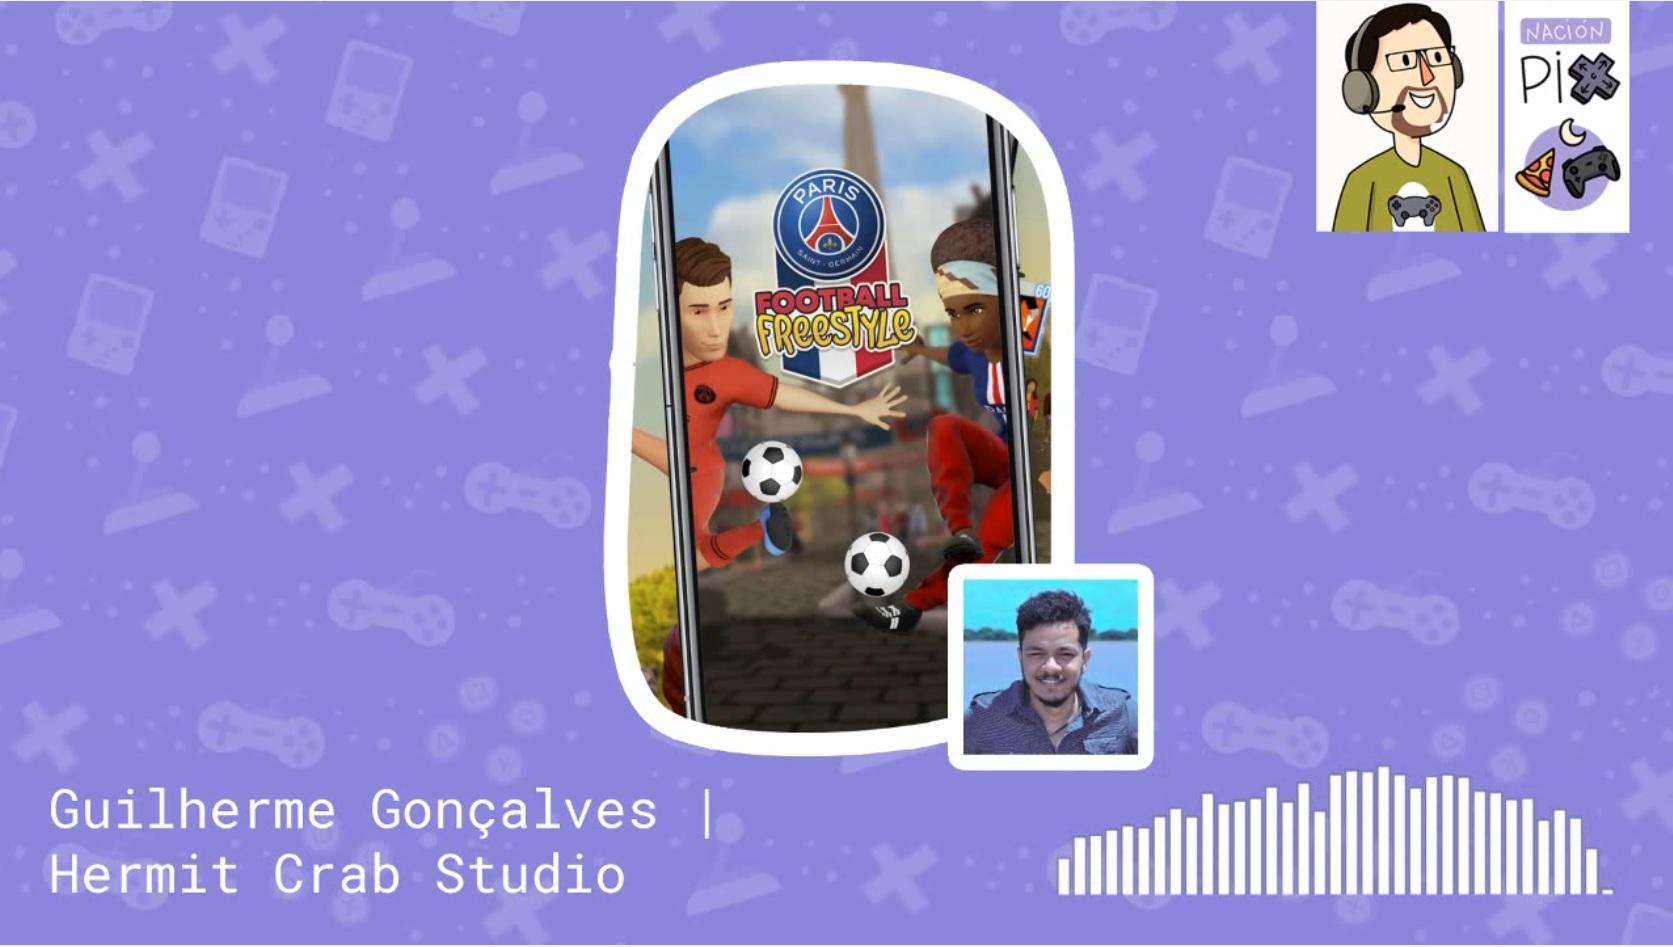 Malteada Pix | ¿Cómo hacen videojuegos en Brasil? (Guilherme Gonçalves – Hermit Crab Game Studio)